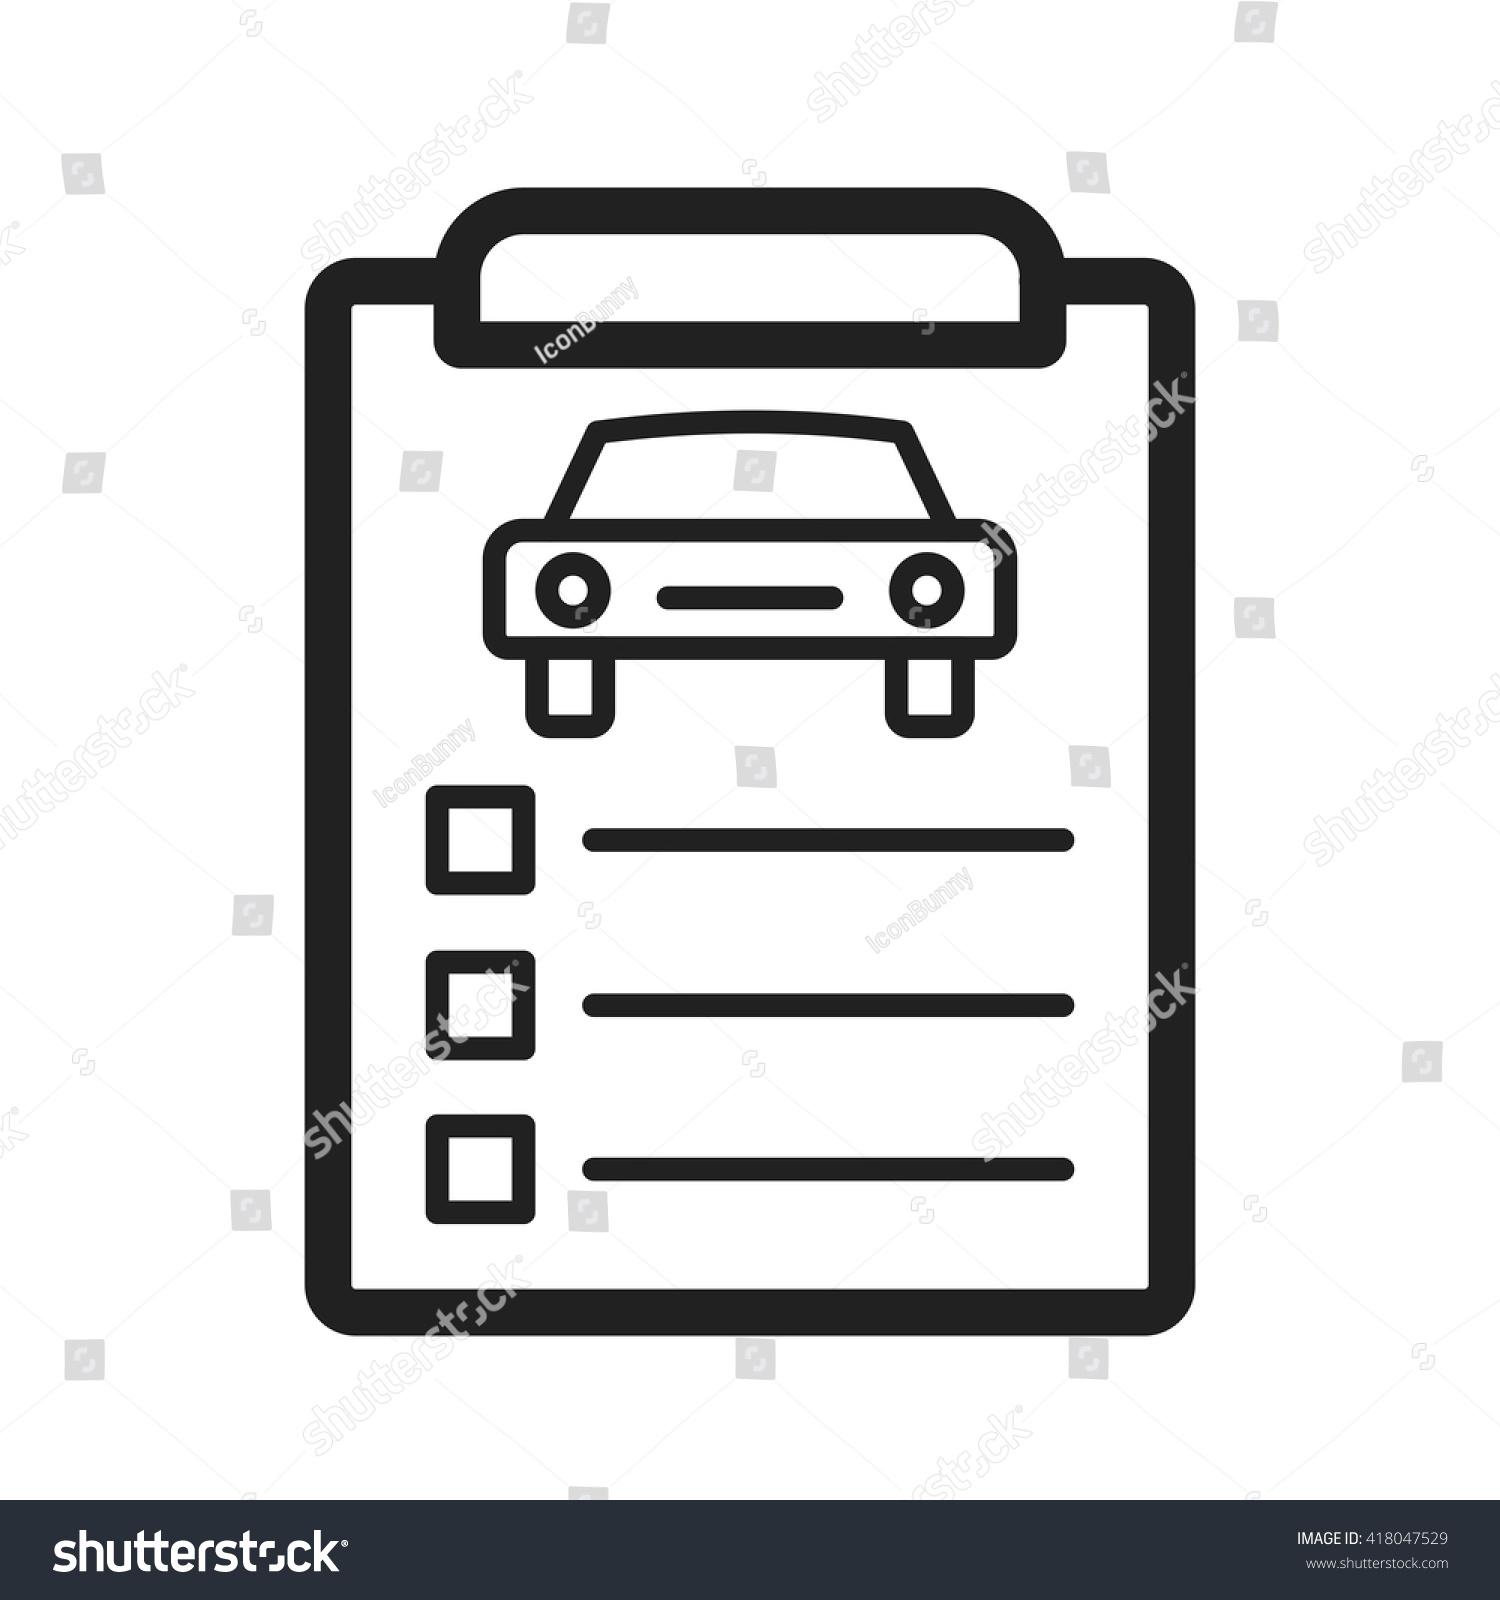 stock vector car items checklist 418047529 car items checklist stock vector (royalty free) 418047529 shutterstock